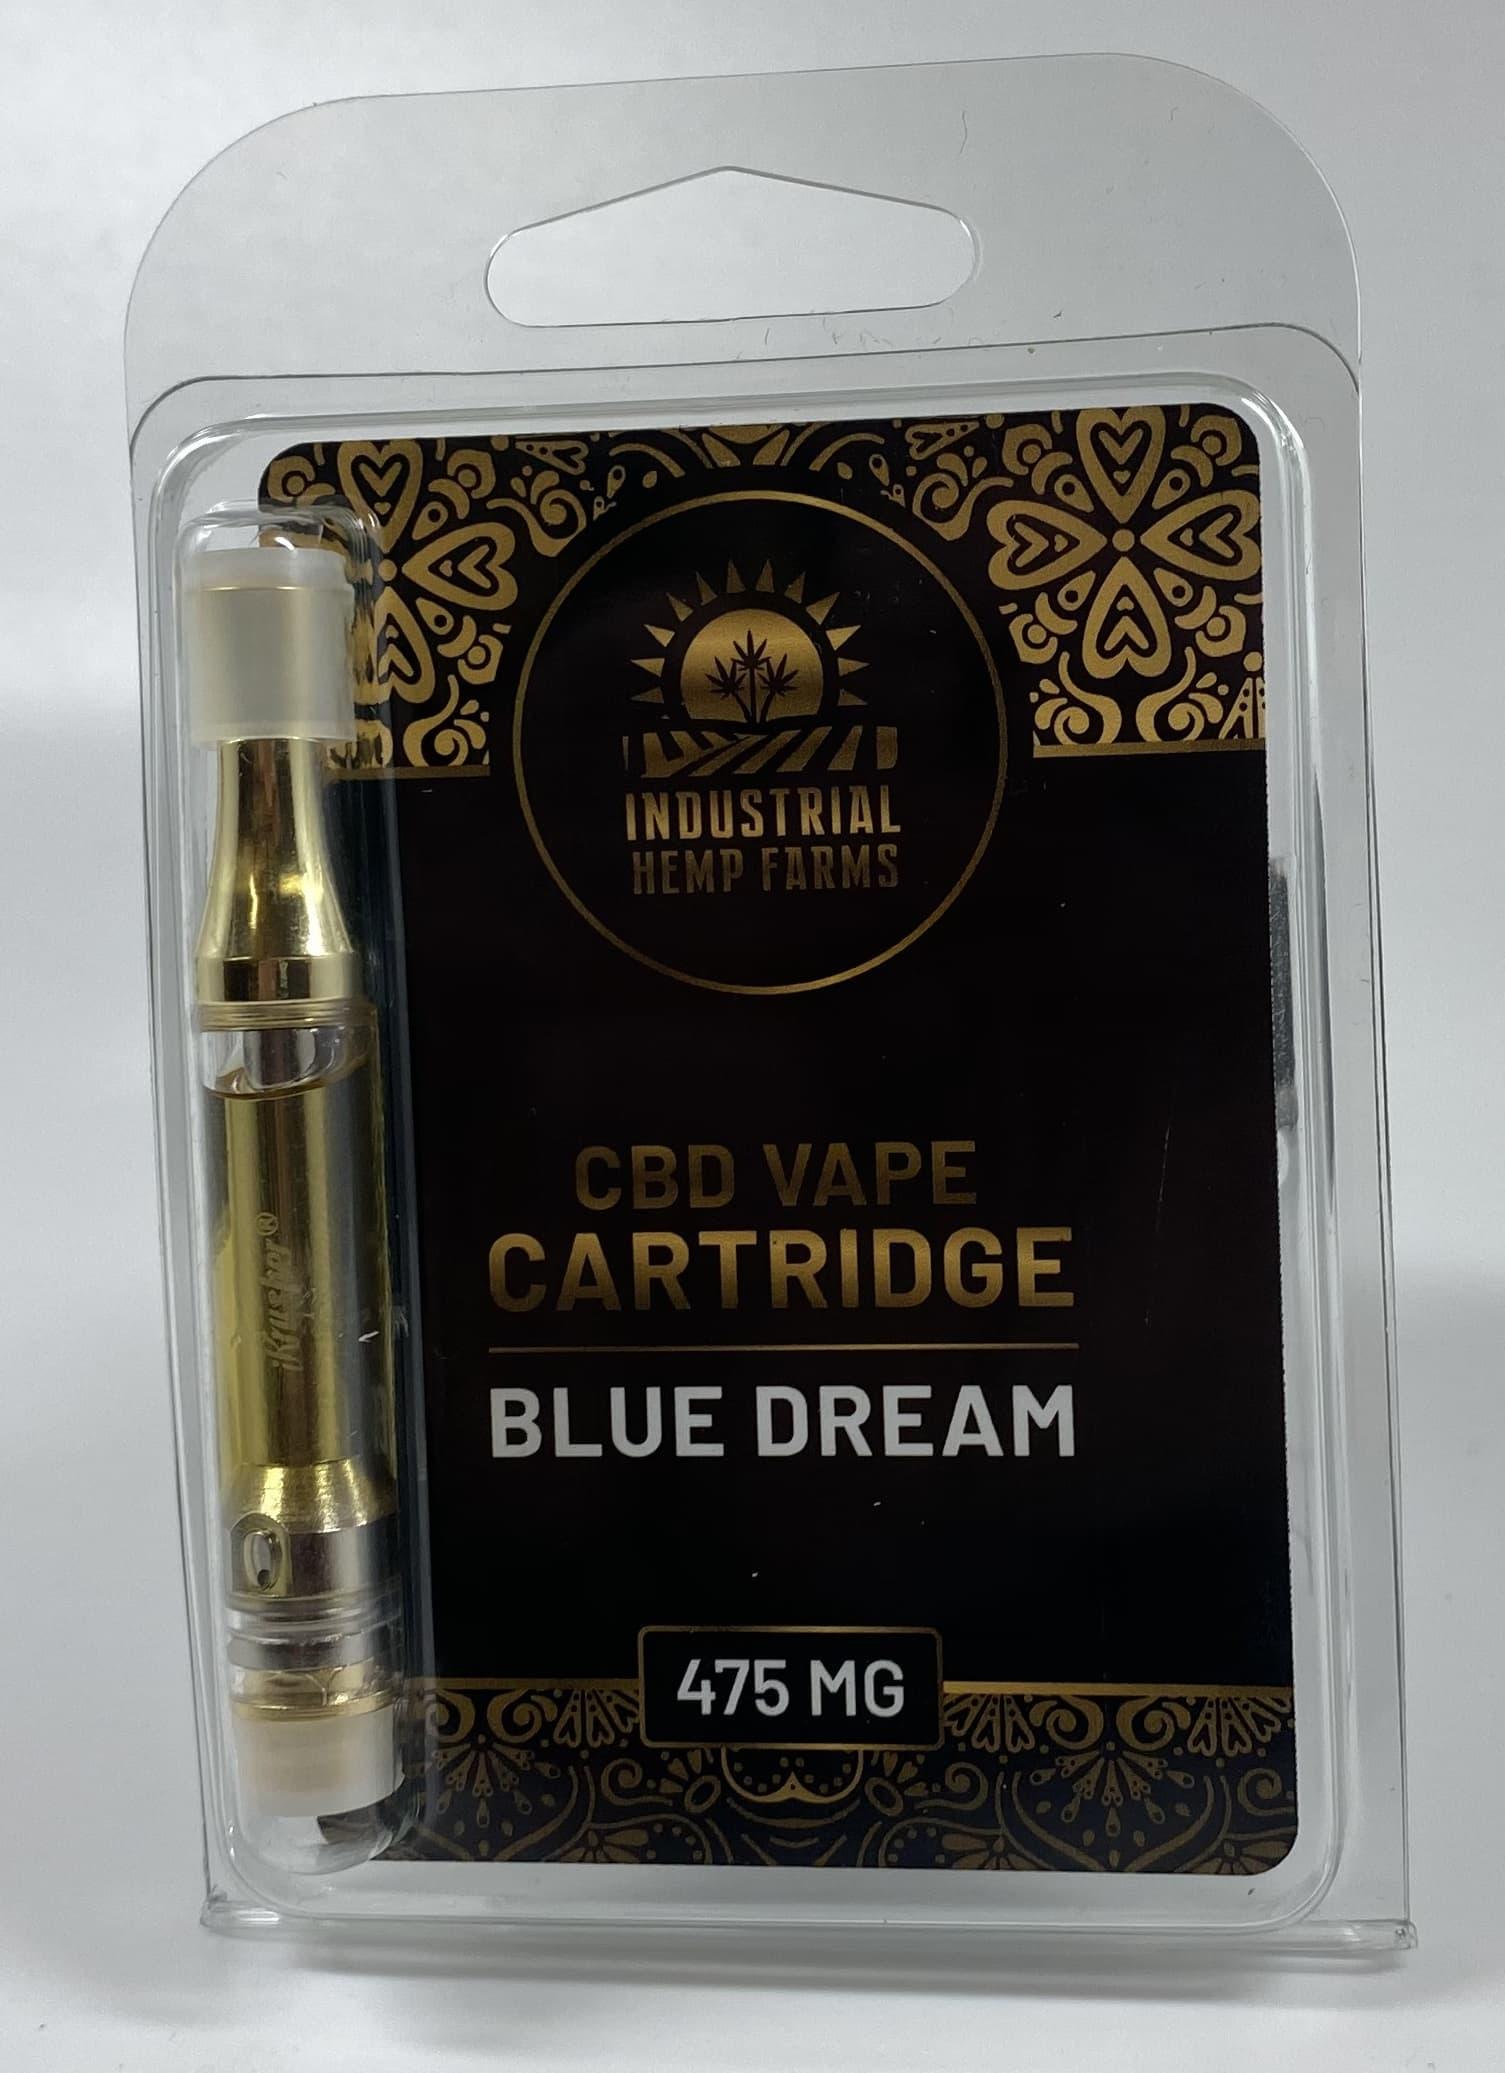 blue dream cbd vape pen cartridge for sale